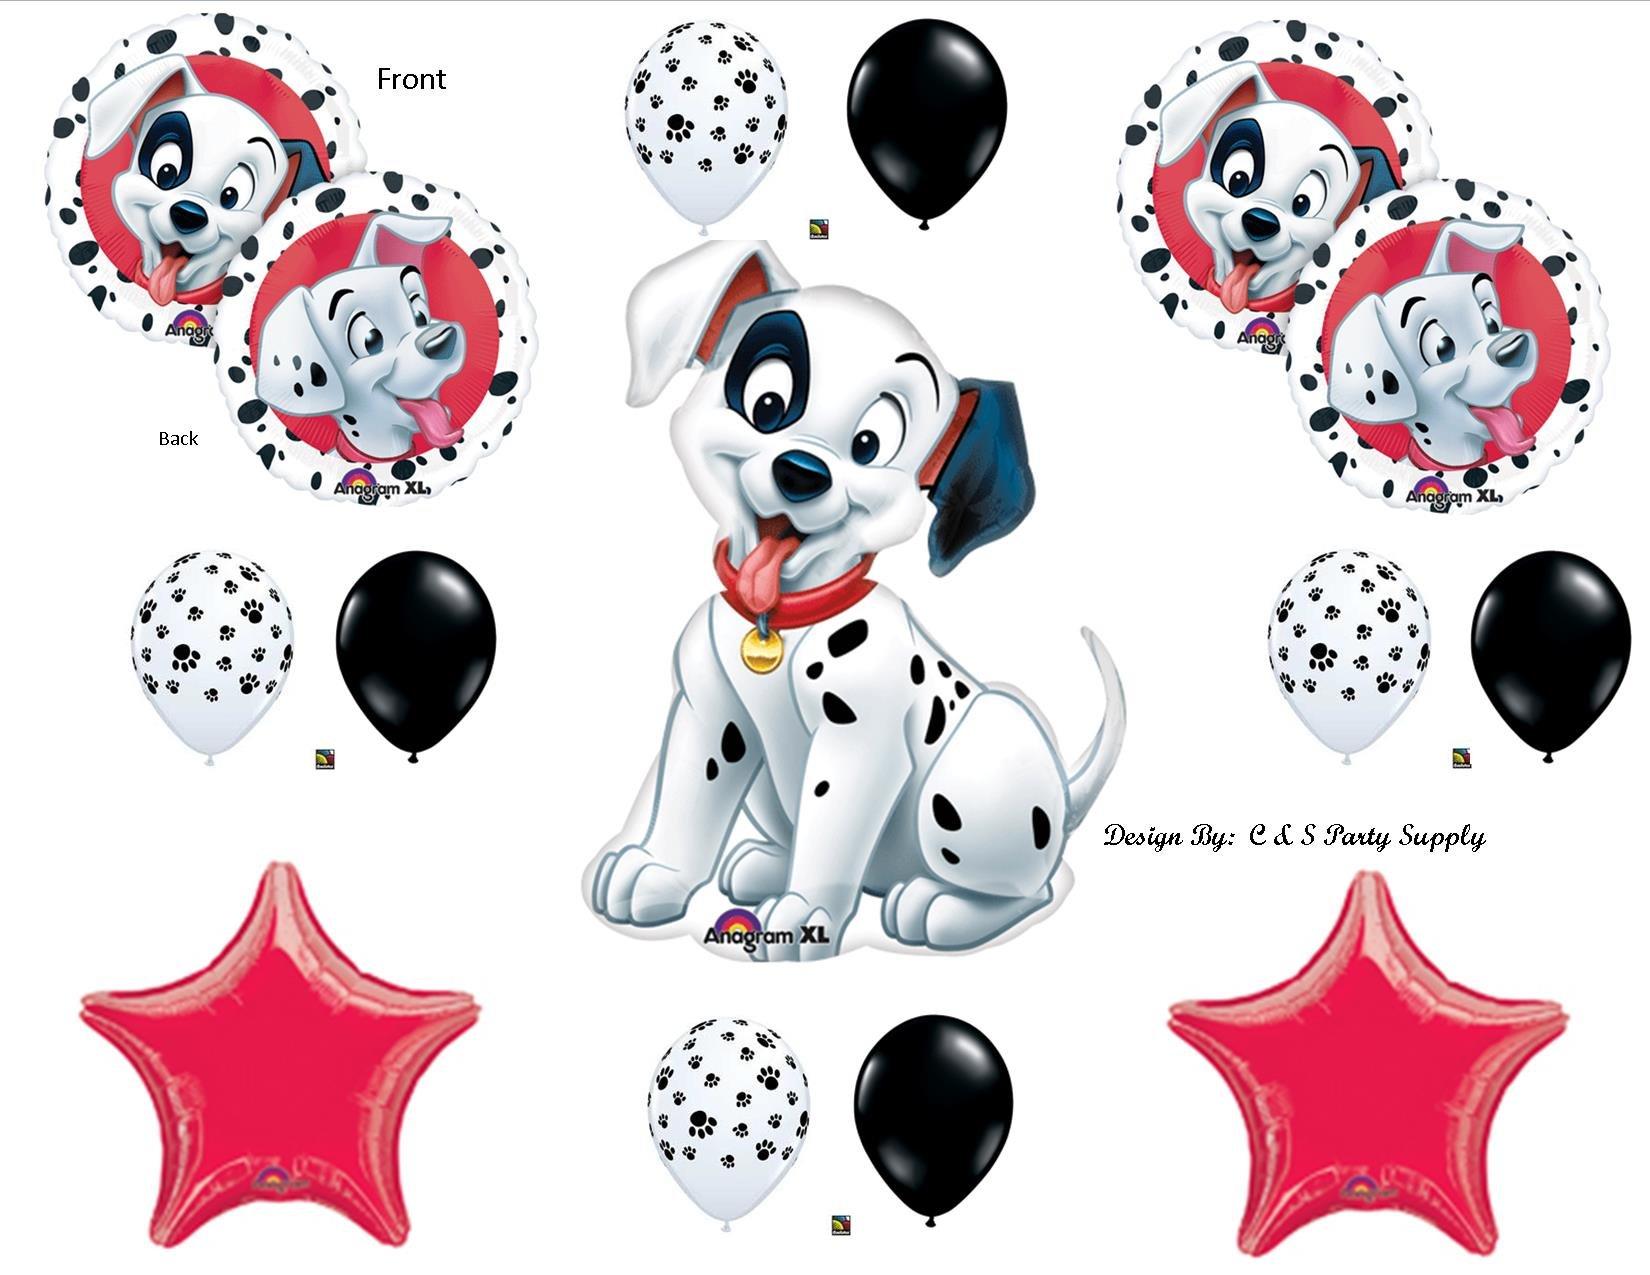 RED 18, LA Balloons Foil Balloon 201686-RED HAPPY BIRTHDAY DALMATIANS